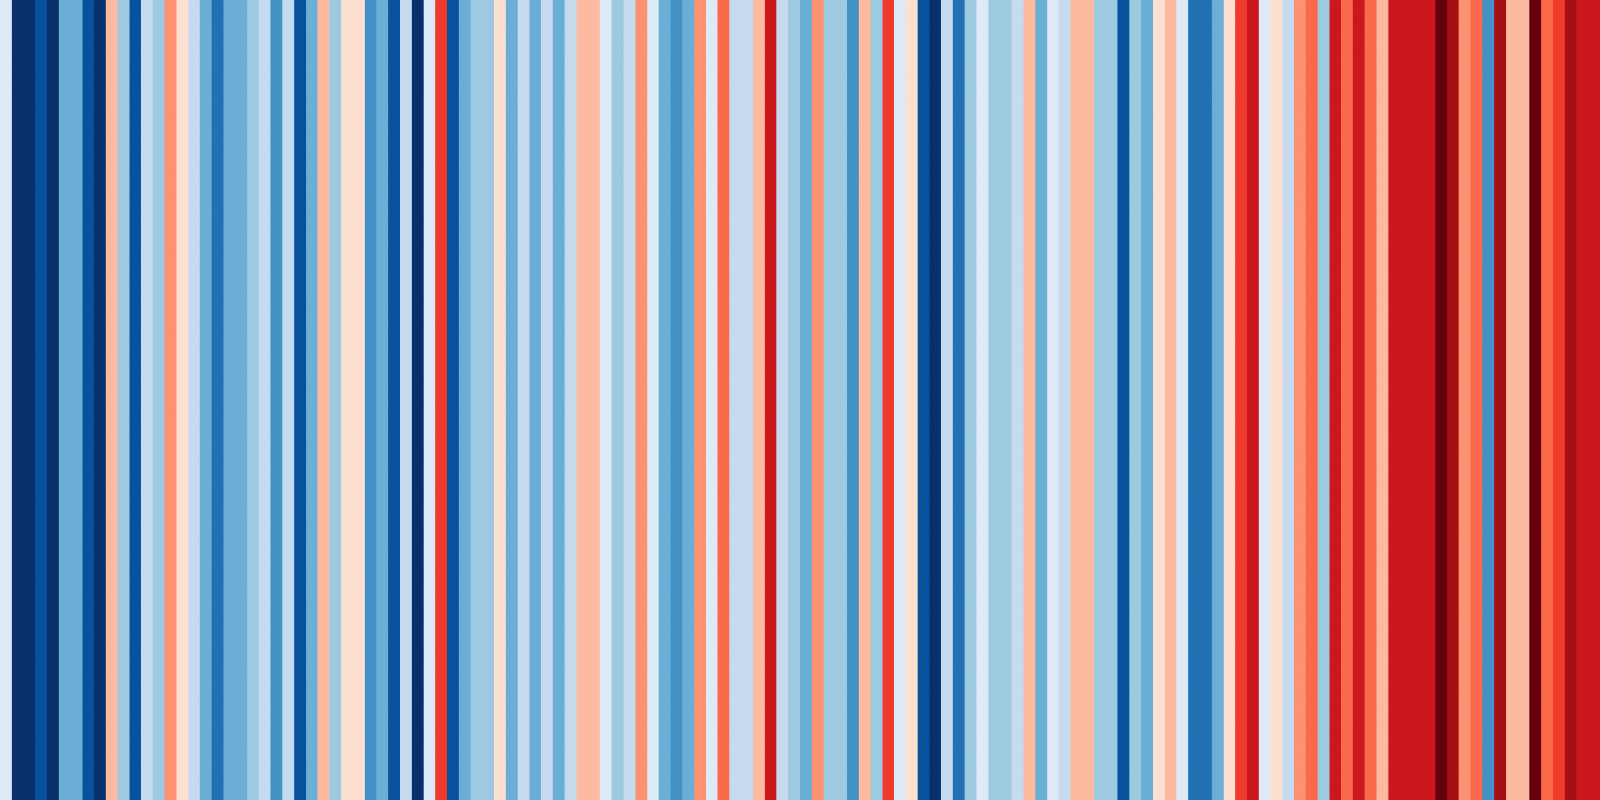 Warming stripes ShowyourStripes